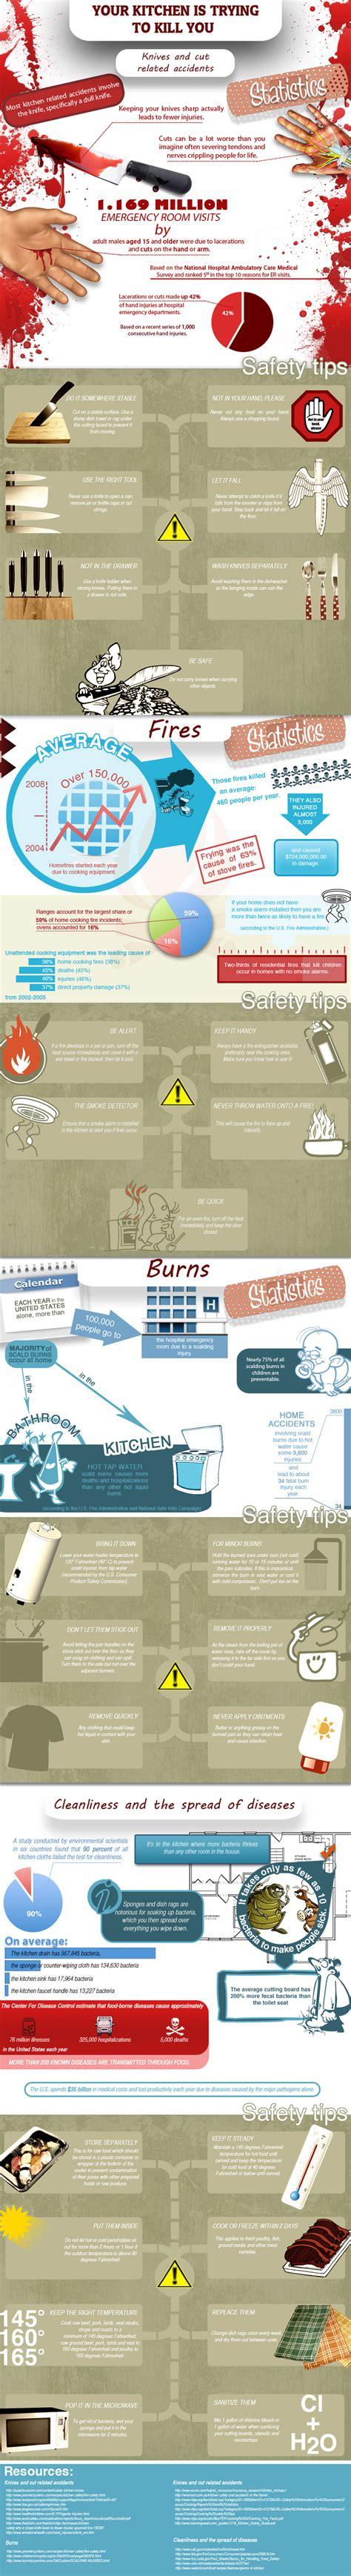 Kitchen Safety by List Of 31 Catchy Kitchen Safety Slogans Brandongaille